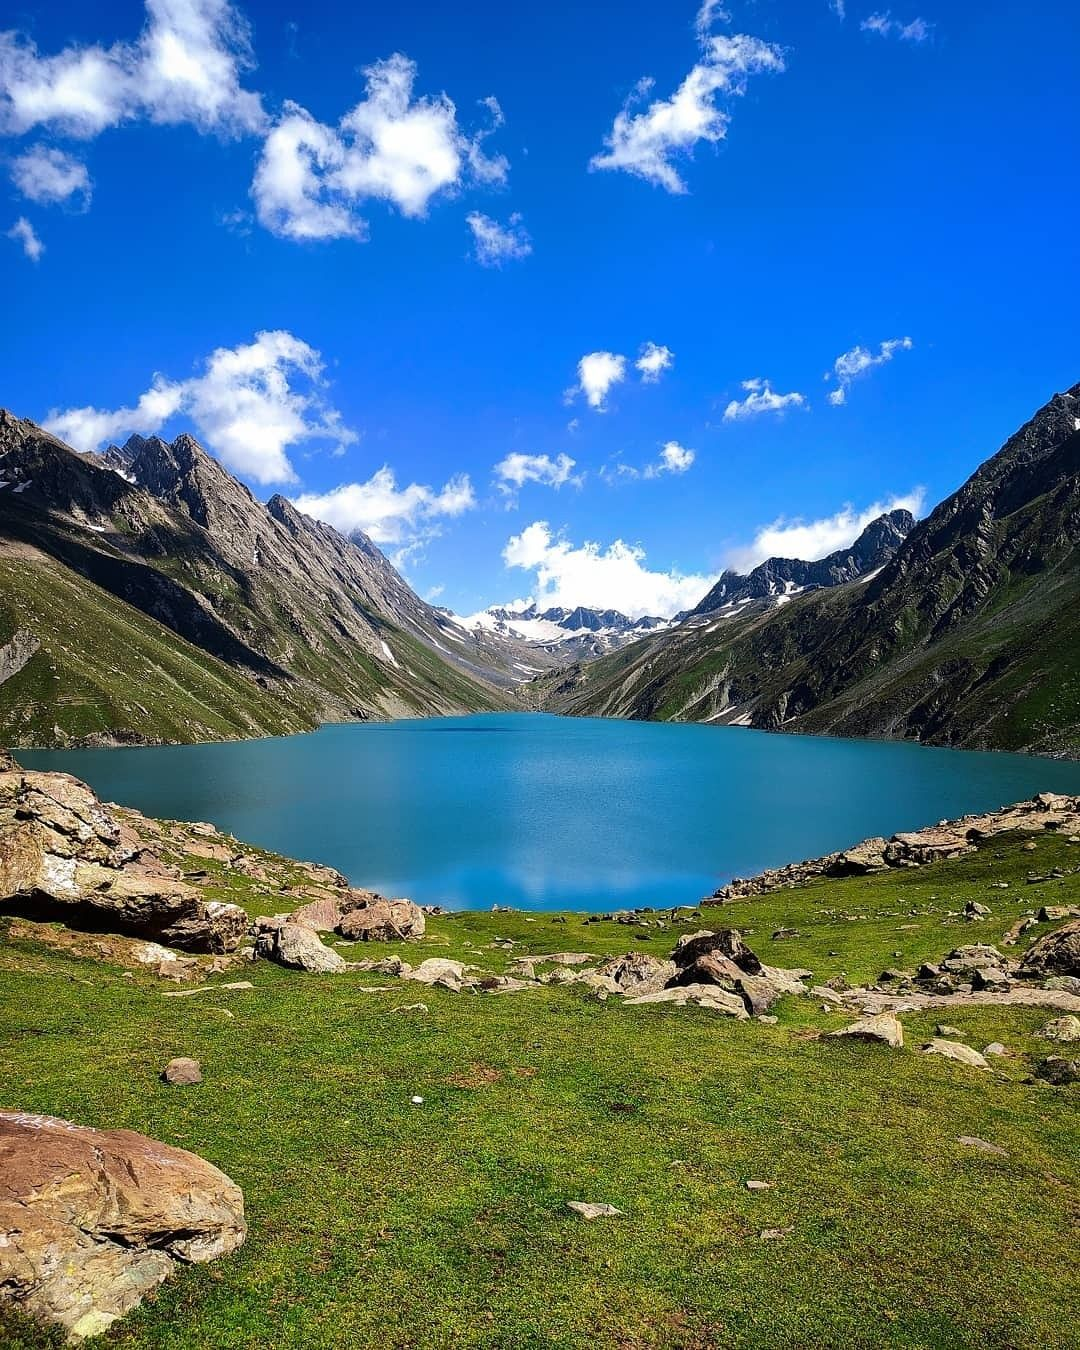 #Repost @azmatwani_ @download.ins --- Take me to a mystical experience. . . . . . #alpine #lake #lonelyplanetindia #hubs_united  #global_hotshotz #igglobal #mountainculture  #treecare #valley #instagood #himalayasin #naturepakistan #f4f  #himalayangeographic #dawndotcom #beingkashmiri  #pictureoftheday #meadow #awesomeearth #artofvisuals #mobilephotography  #igersoftheday #meadow #wanderlust #explore #mobilephotography #YourShotPhotographer